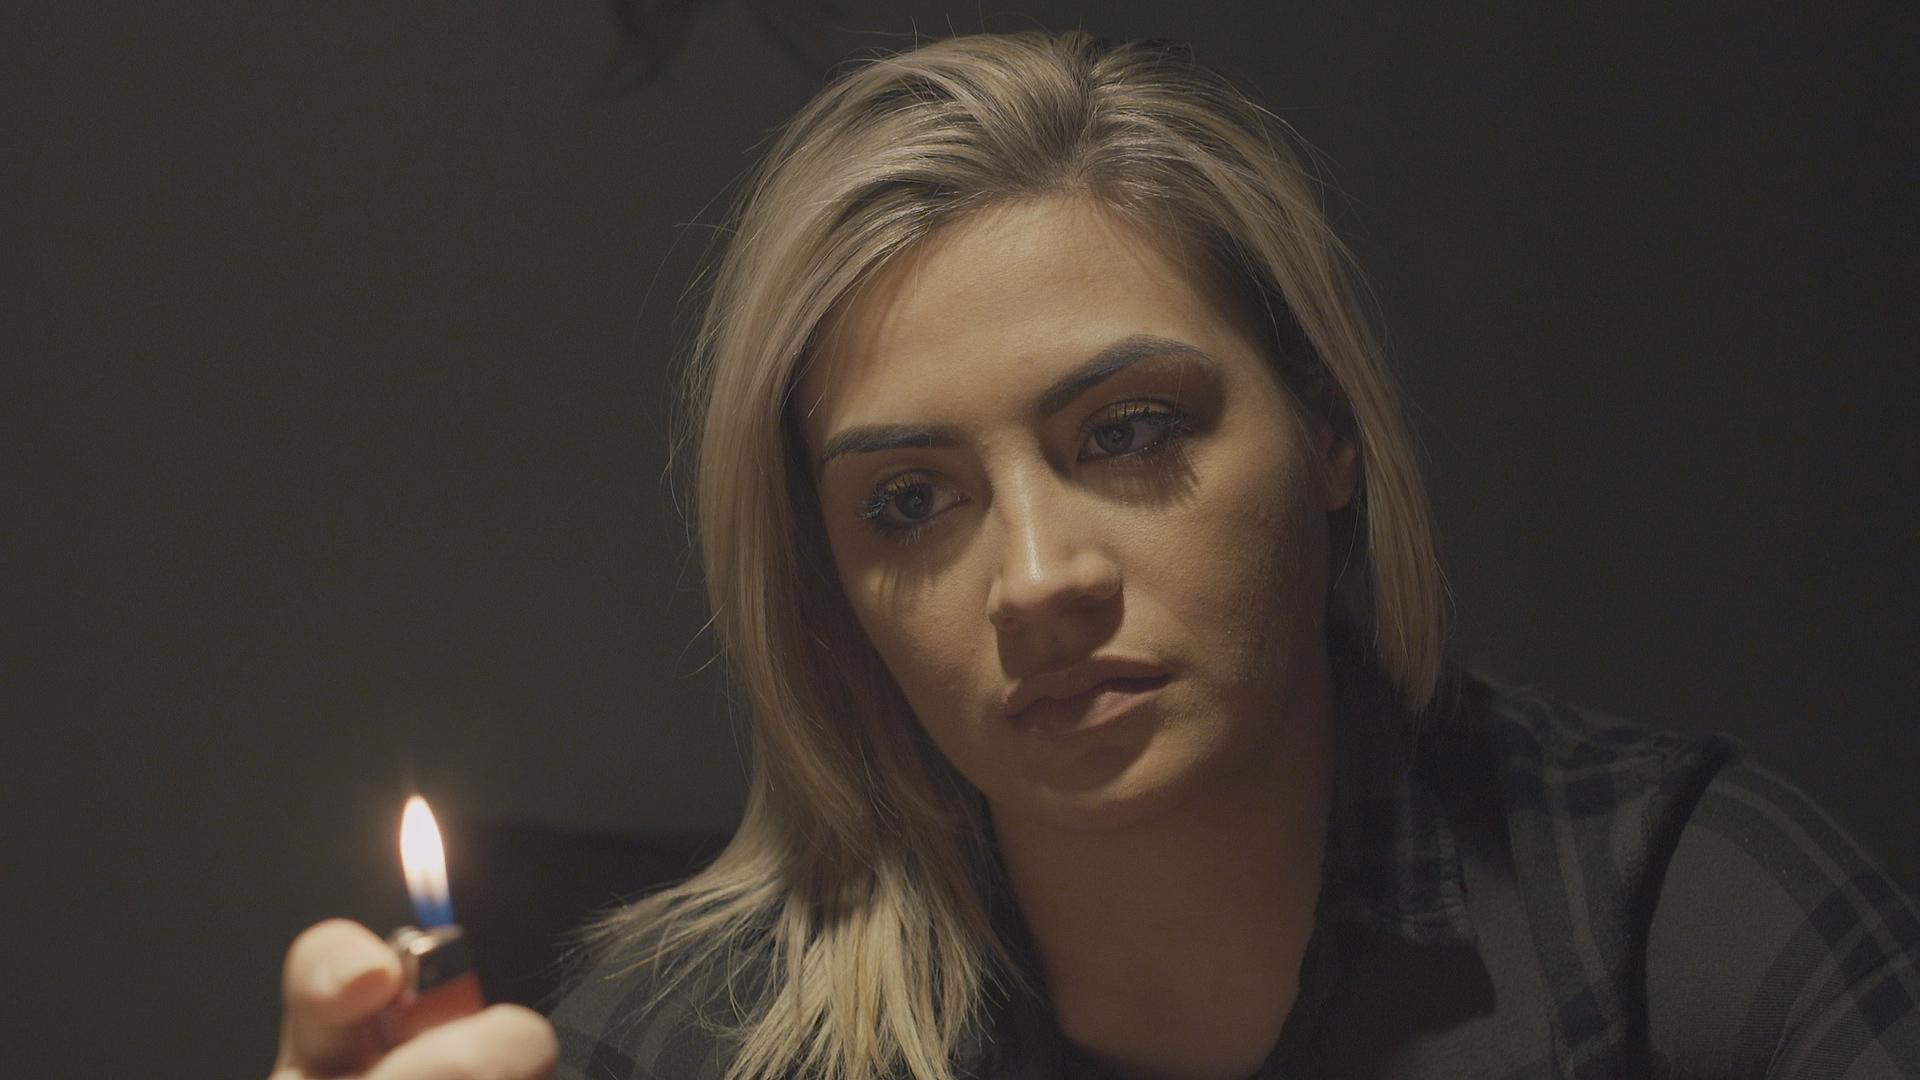 Tiffany's haunting story continues (this season portrayed by Harley Cabrera)